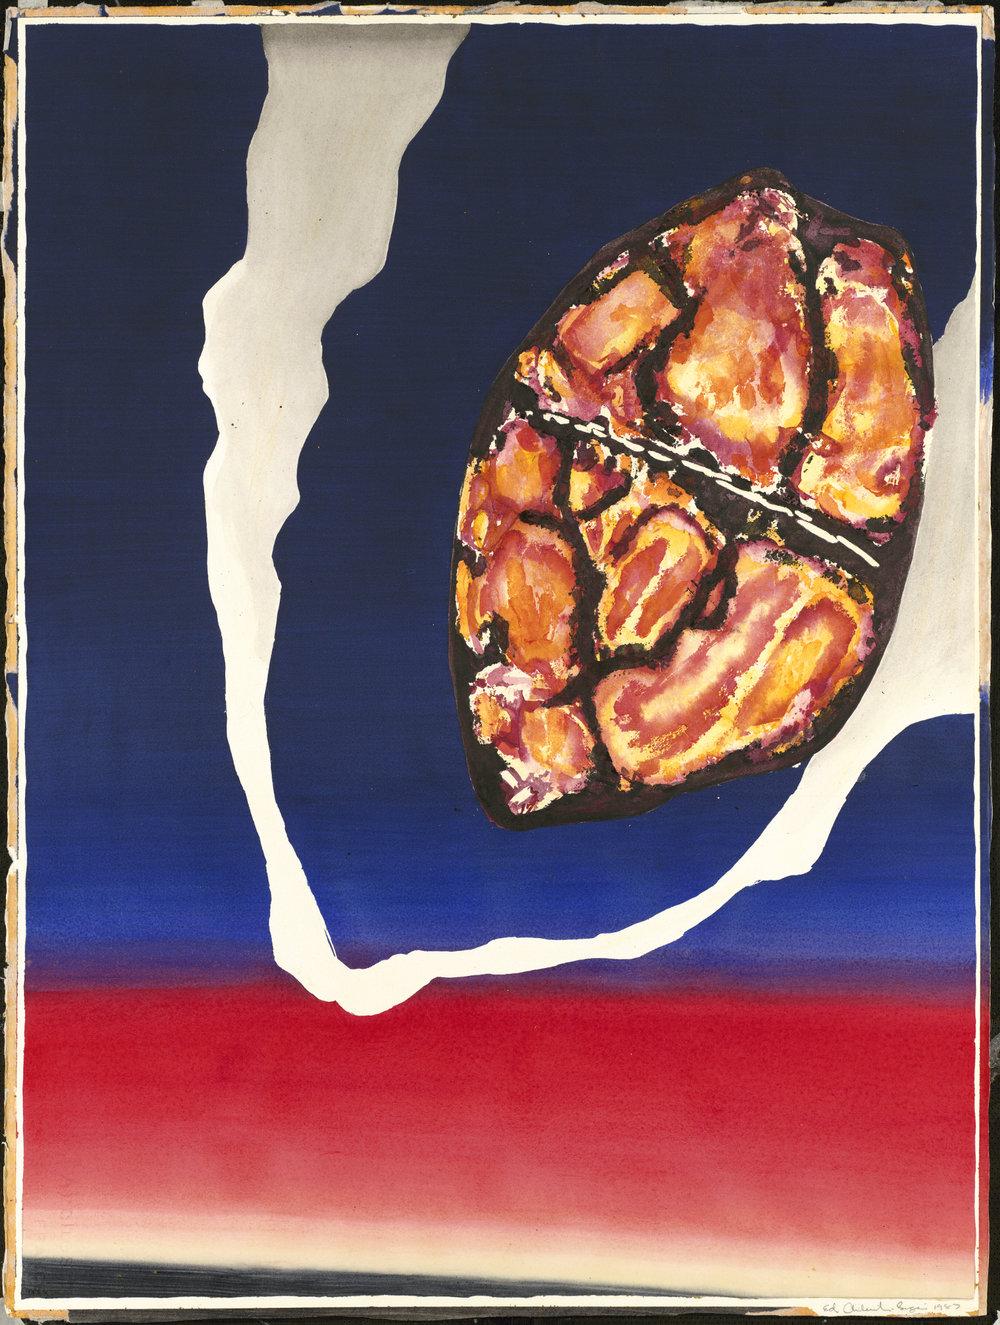 Cells: C-10 Study #1, 1987